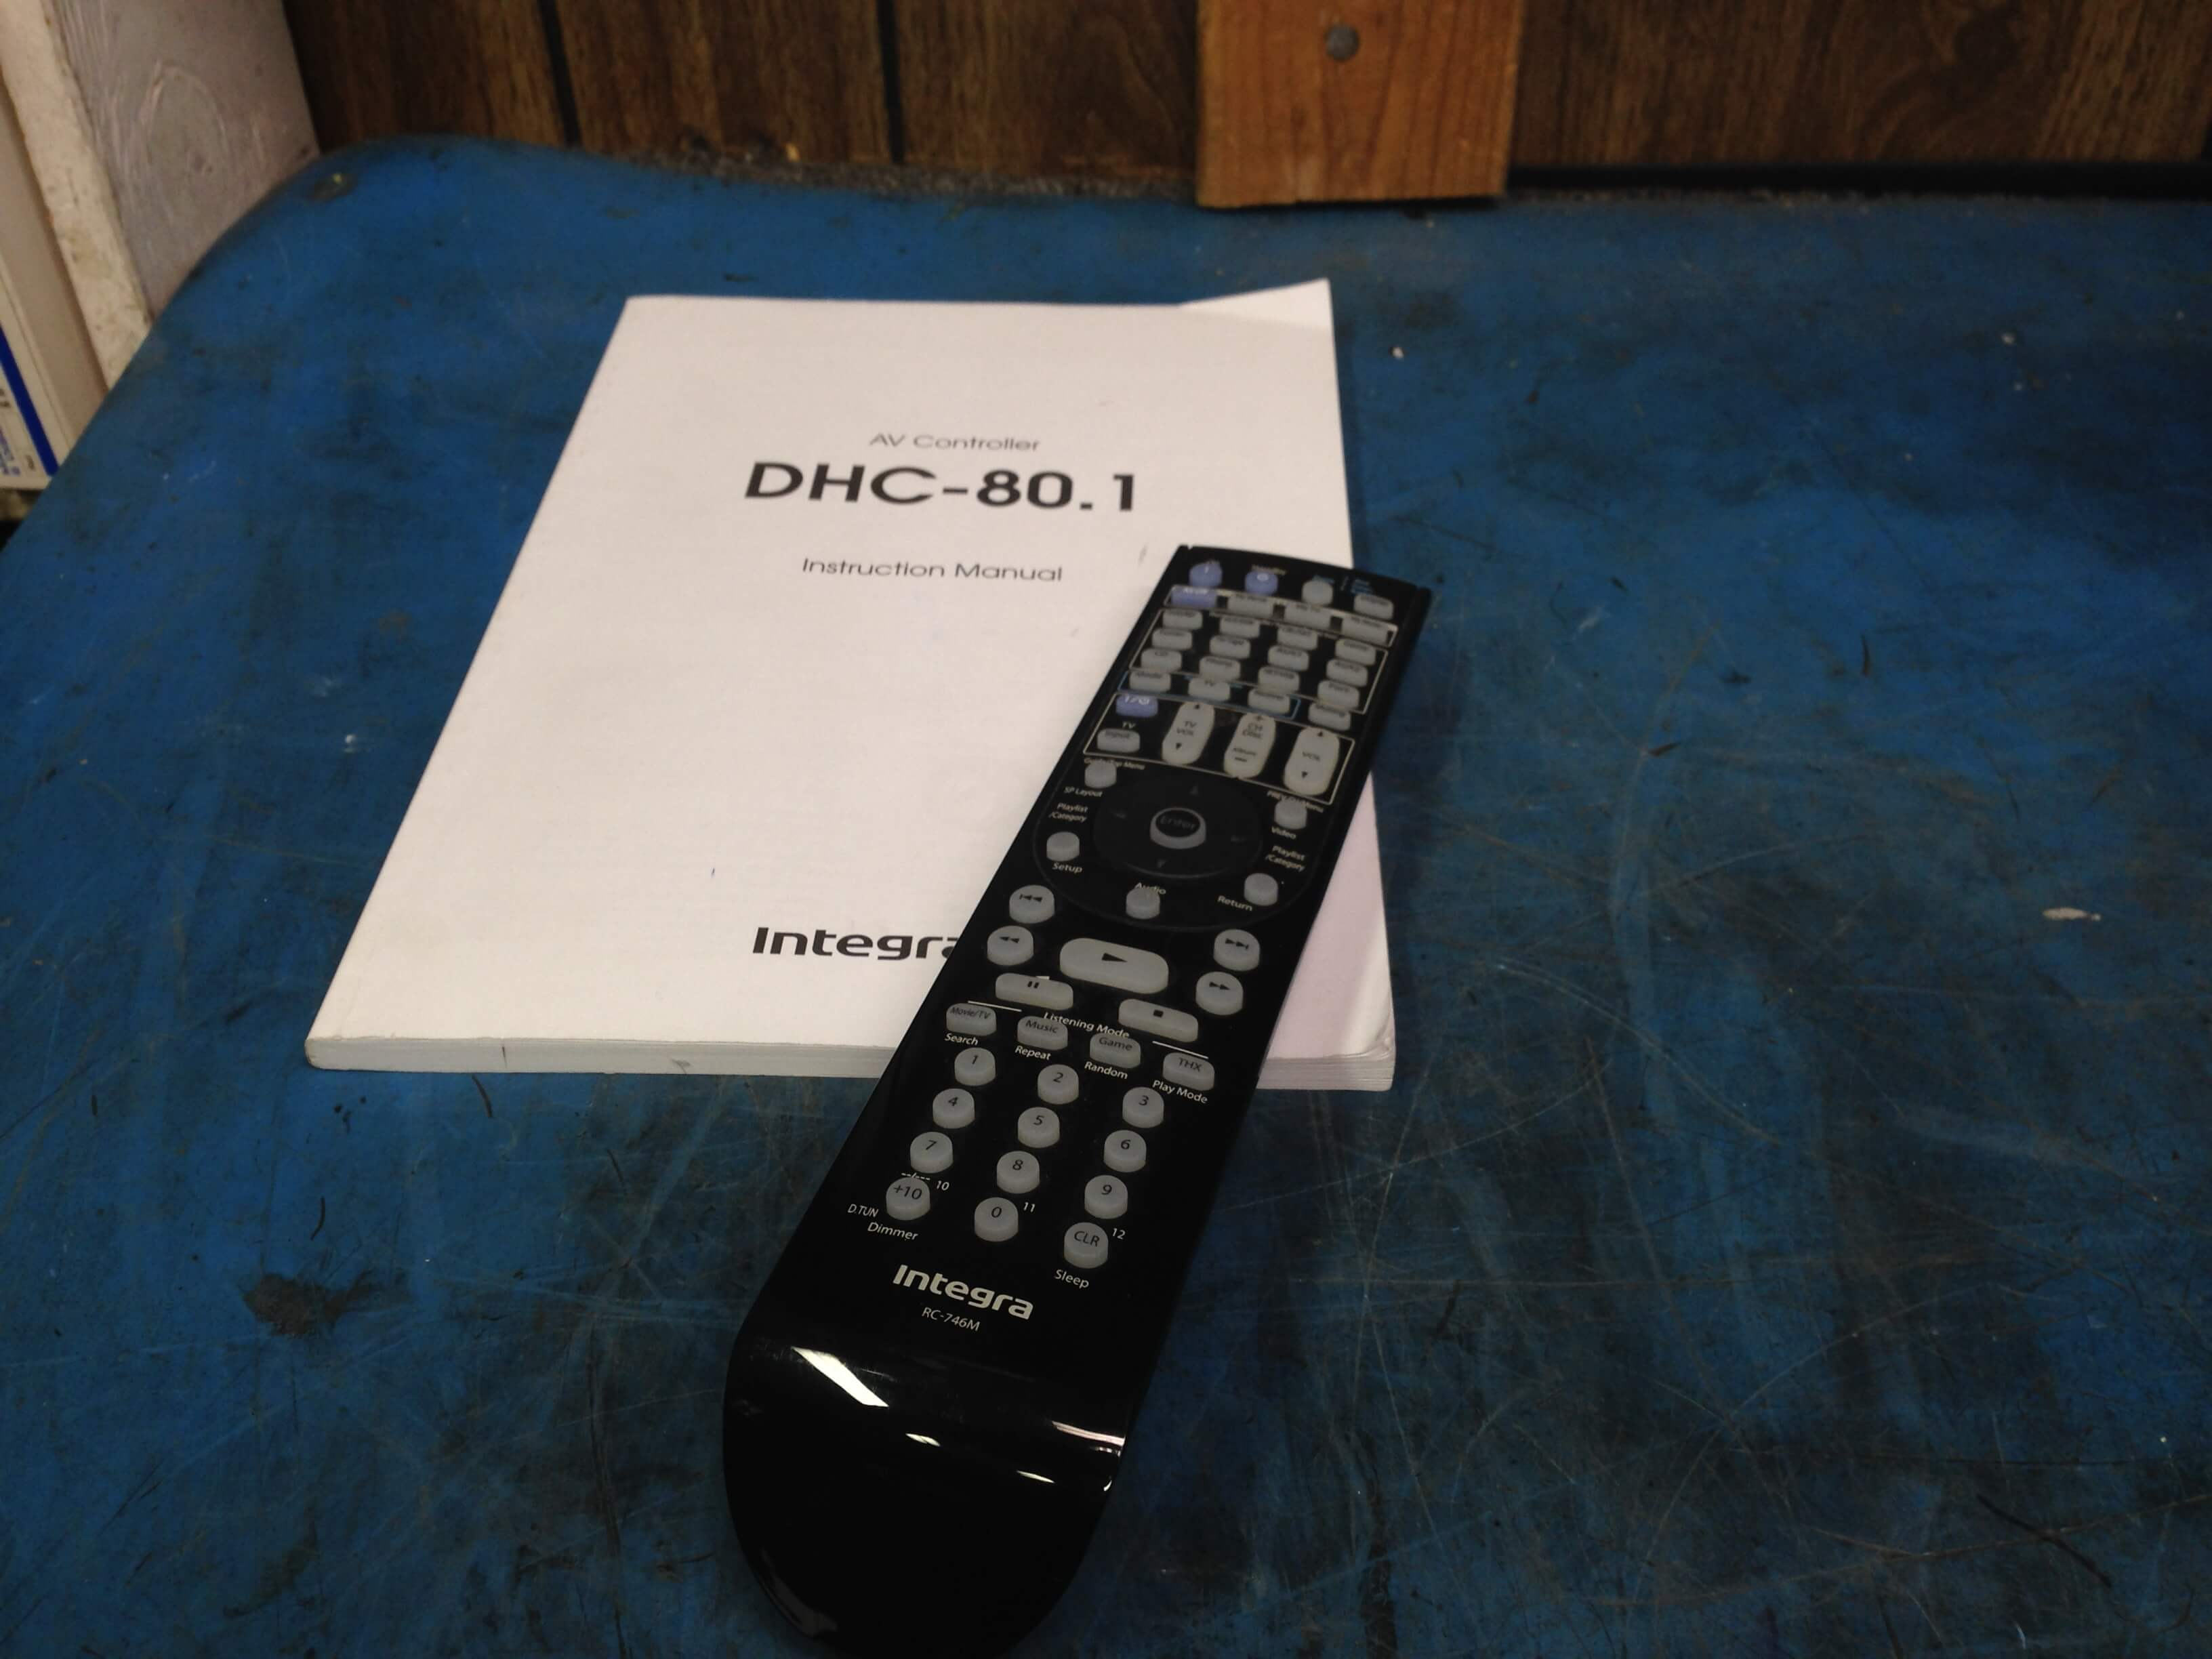 Integra DHC-80.1 AV Controller